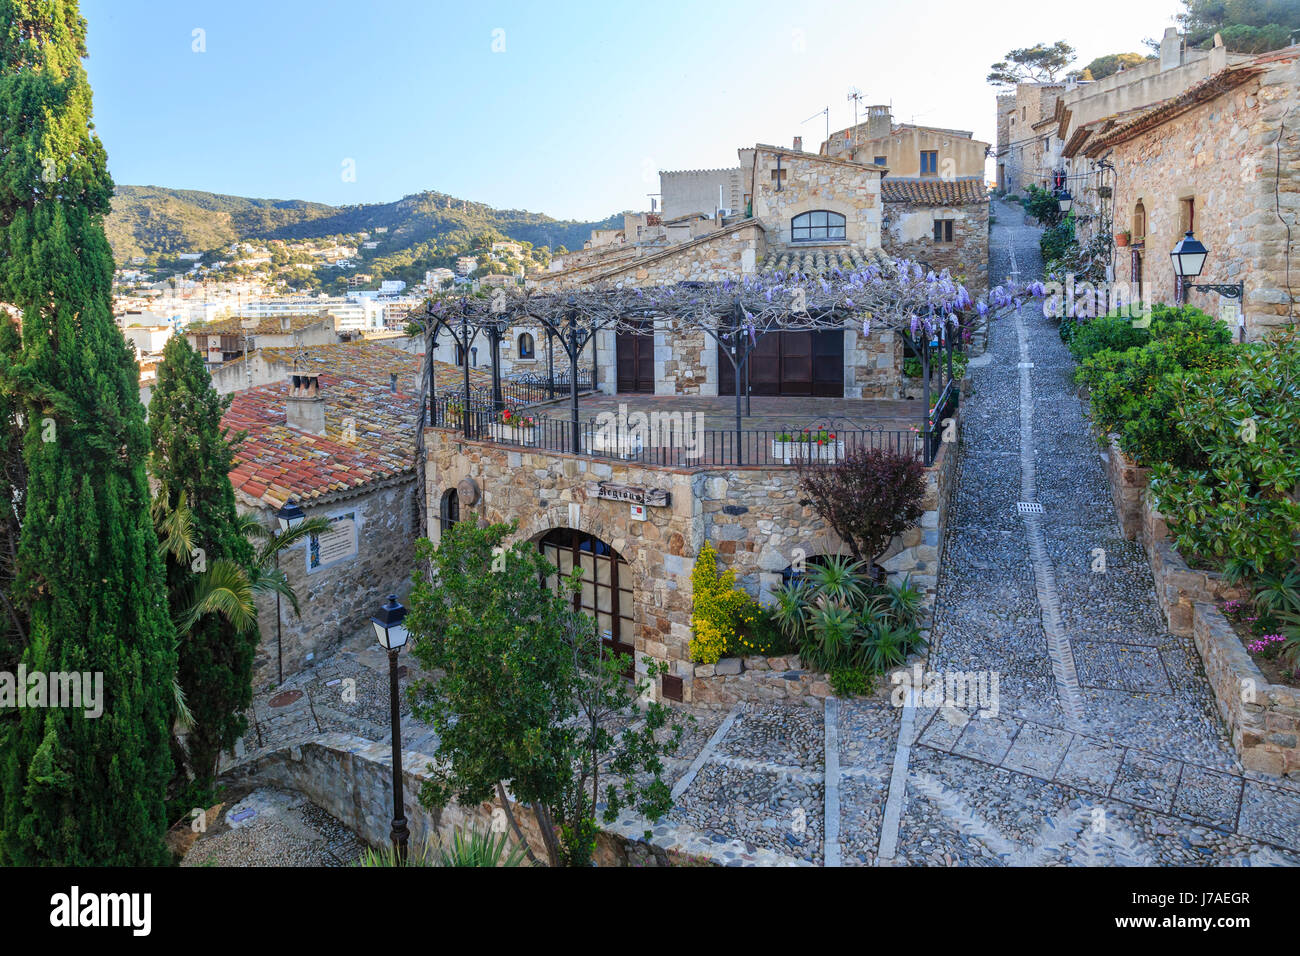 Spain, Catalonia, Costa Brava, Tossa de Mar, inside the Vila Vella - Stock Image